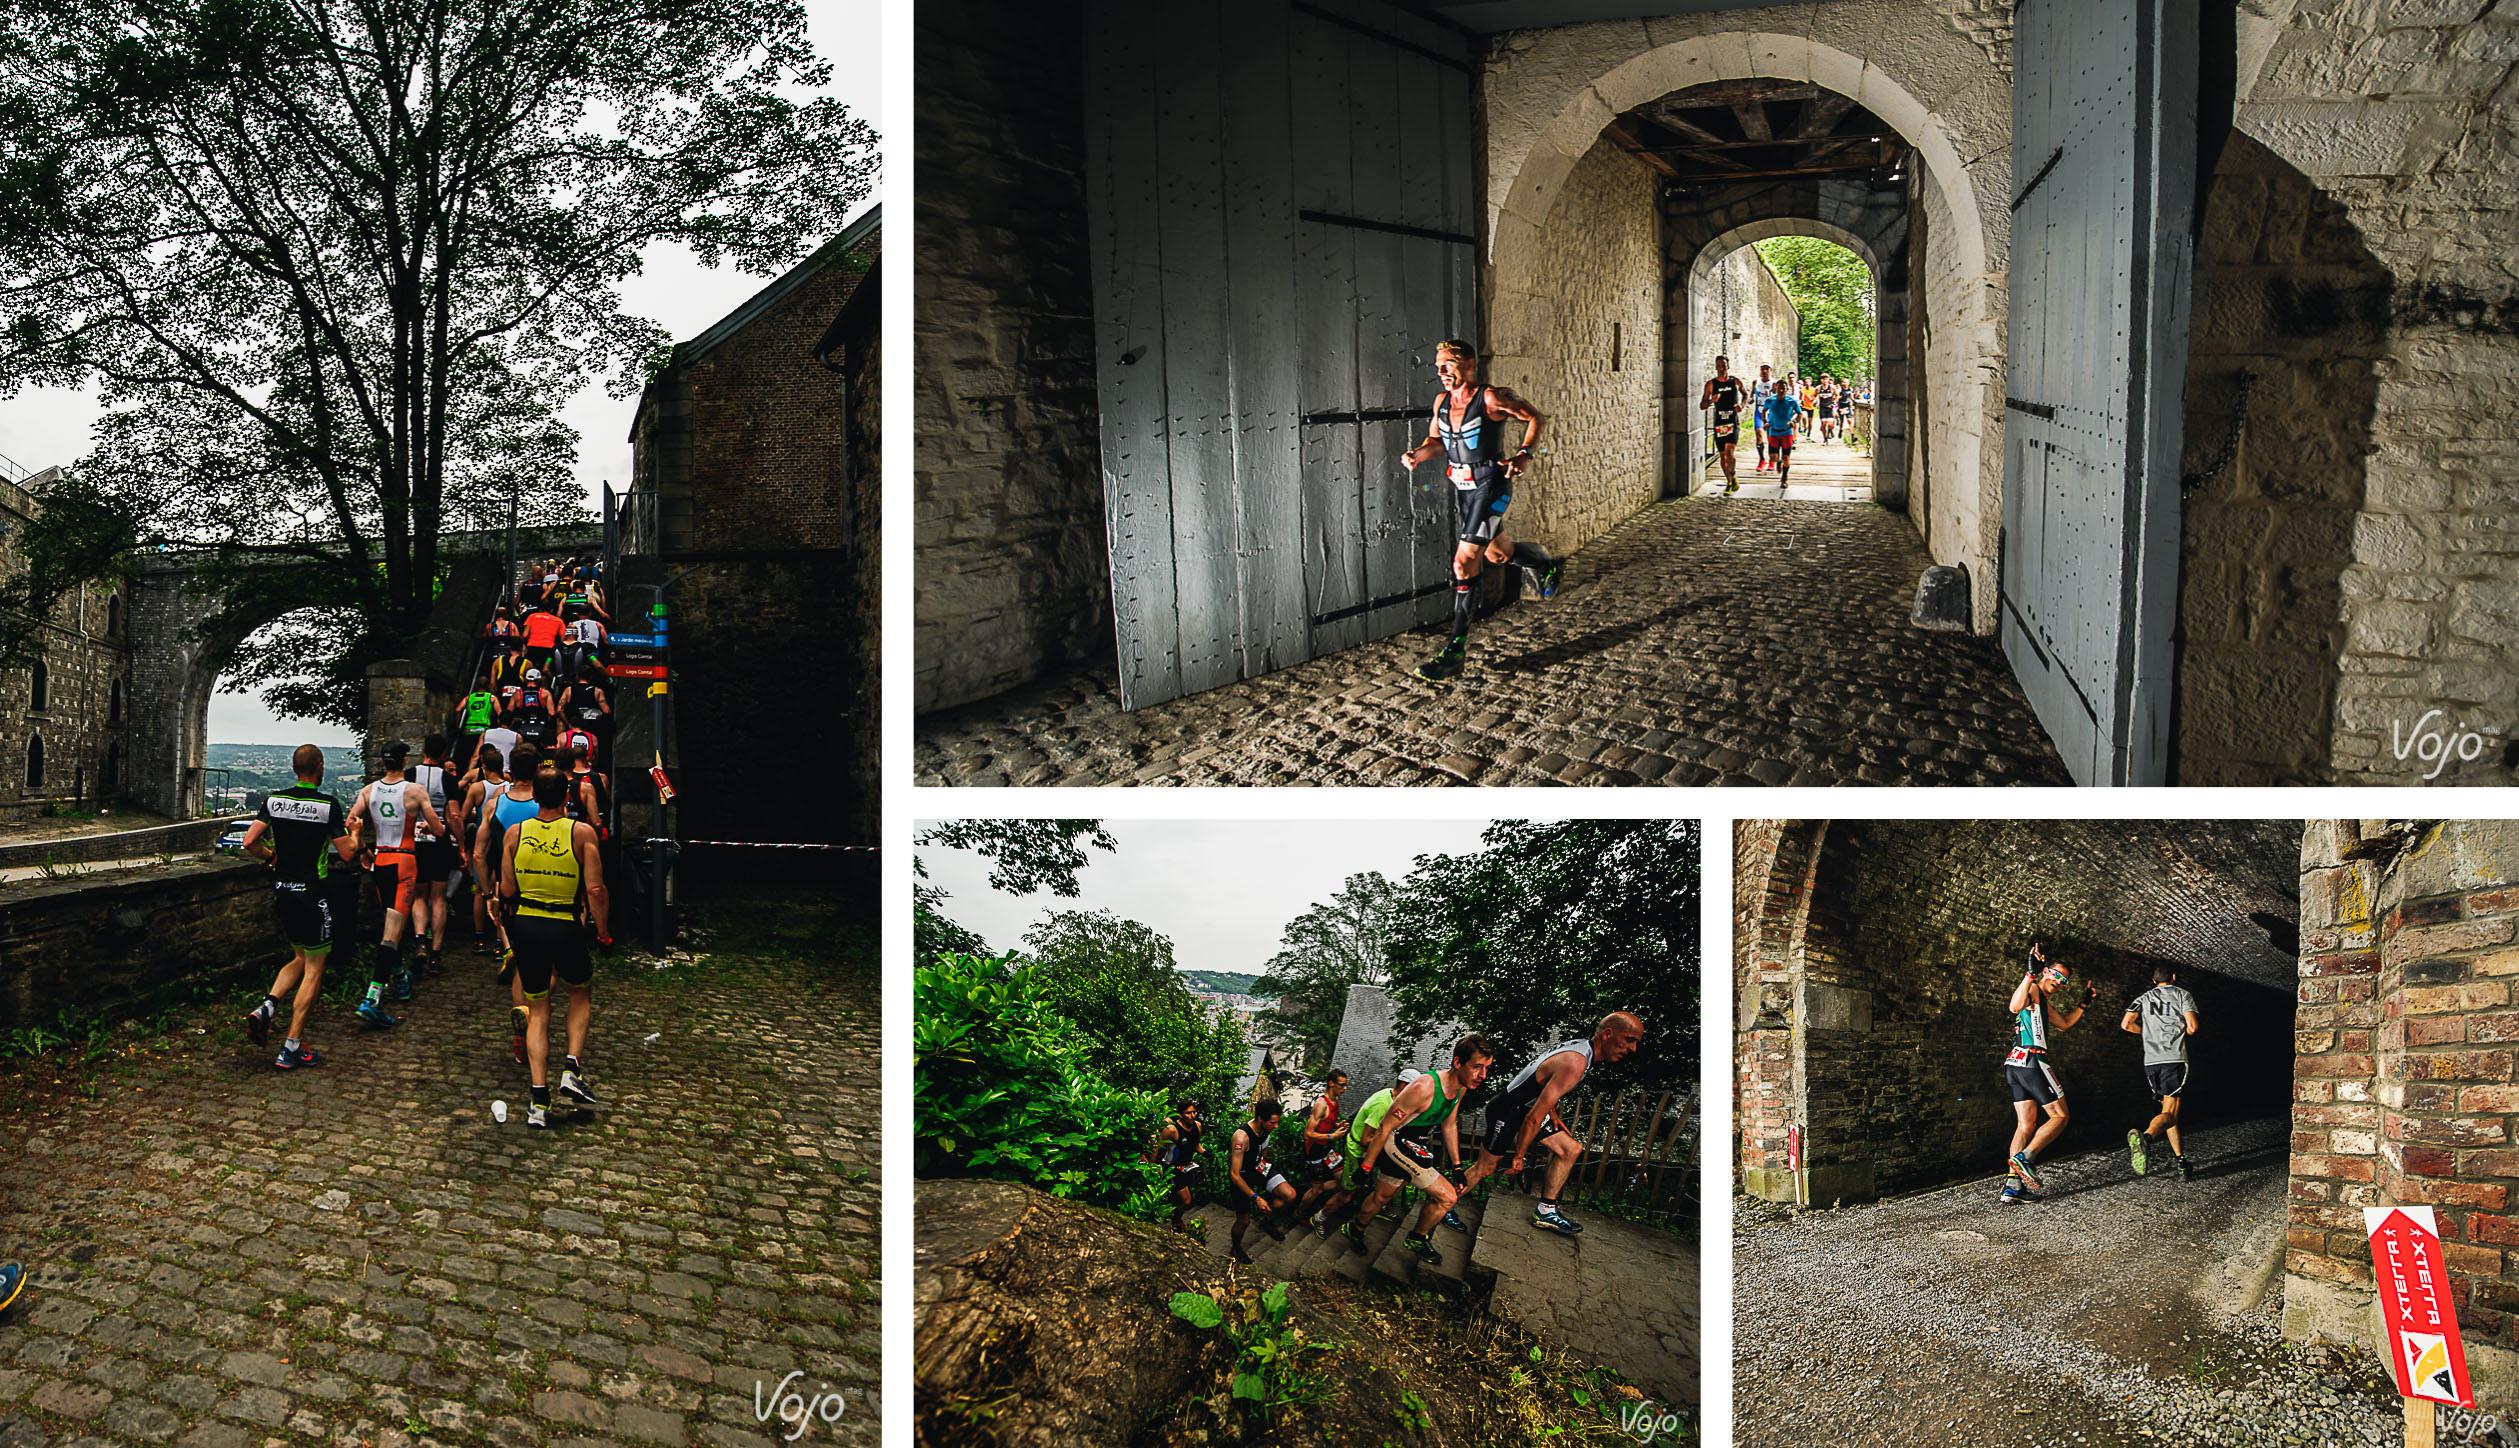 3-XTerra_Belgium_2016_Copyright_OBeart_VojoMag-1